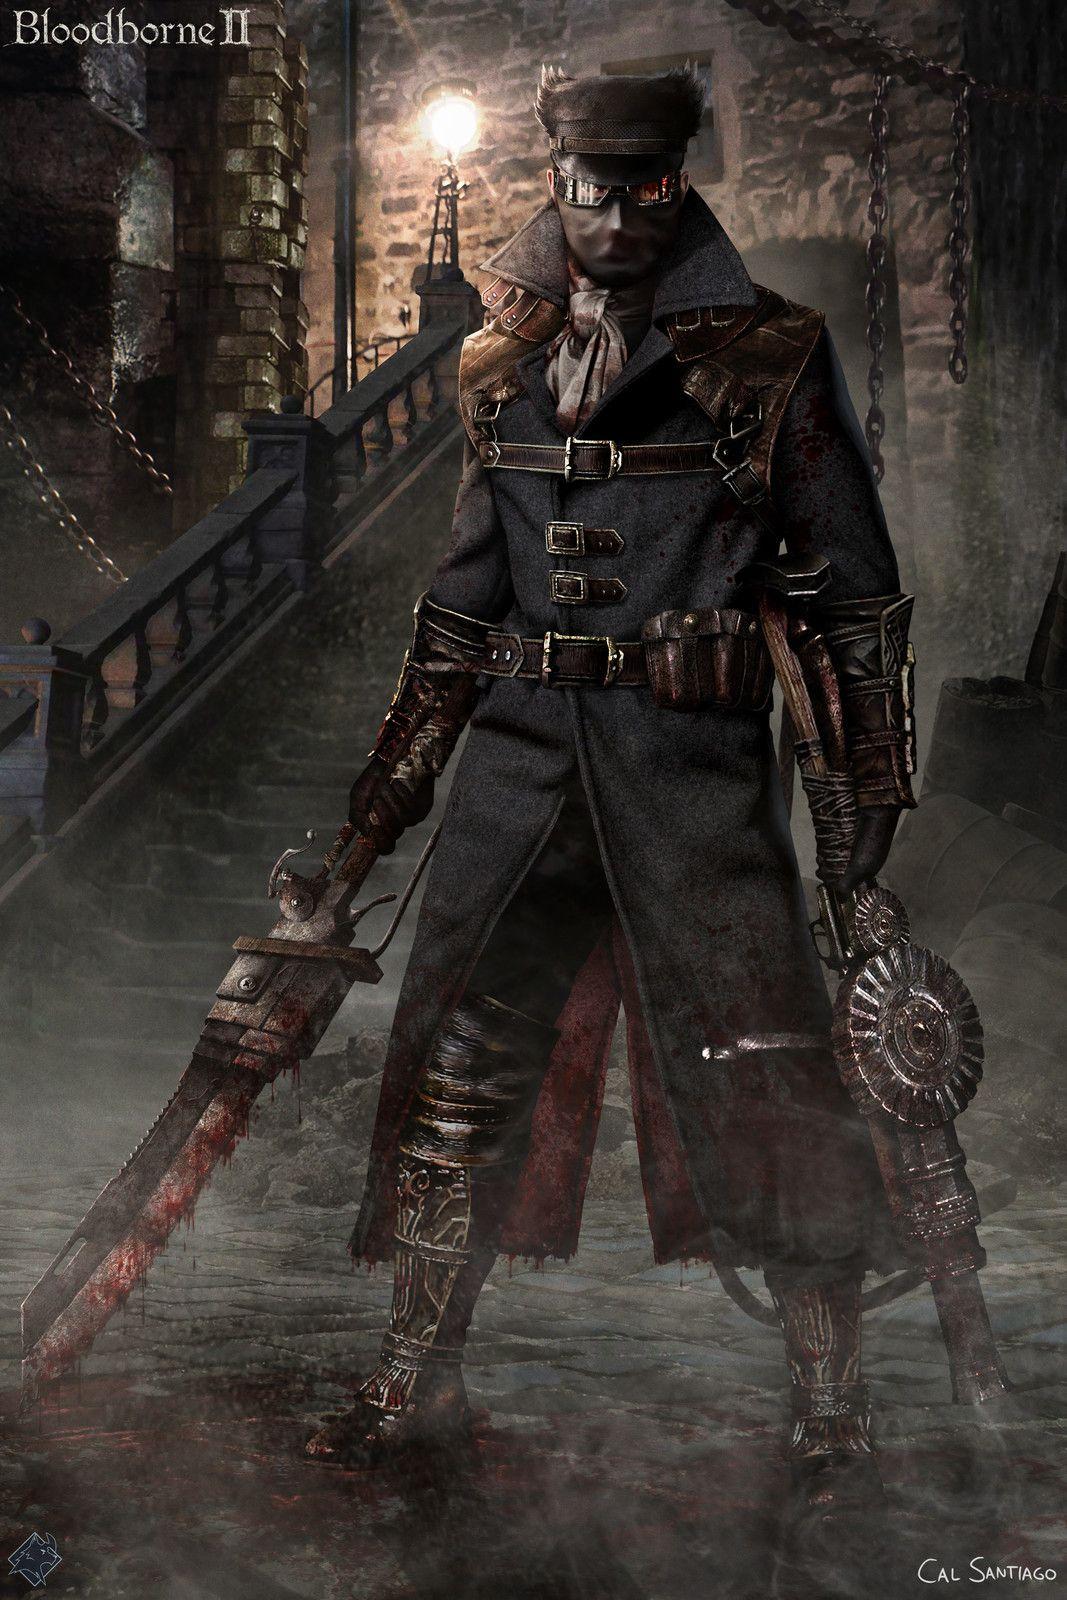 Pin By Elijah Aquino On Dark Souls Bloodborne Bloodborne Art